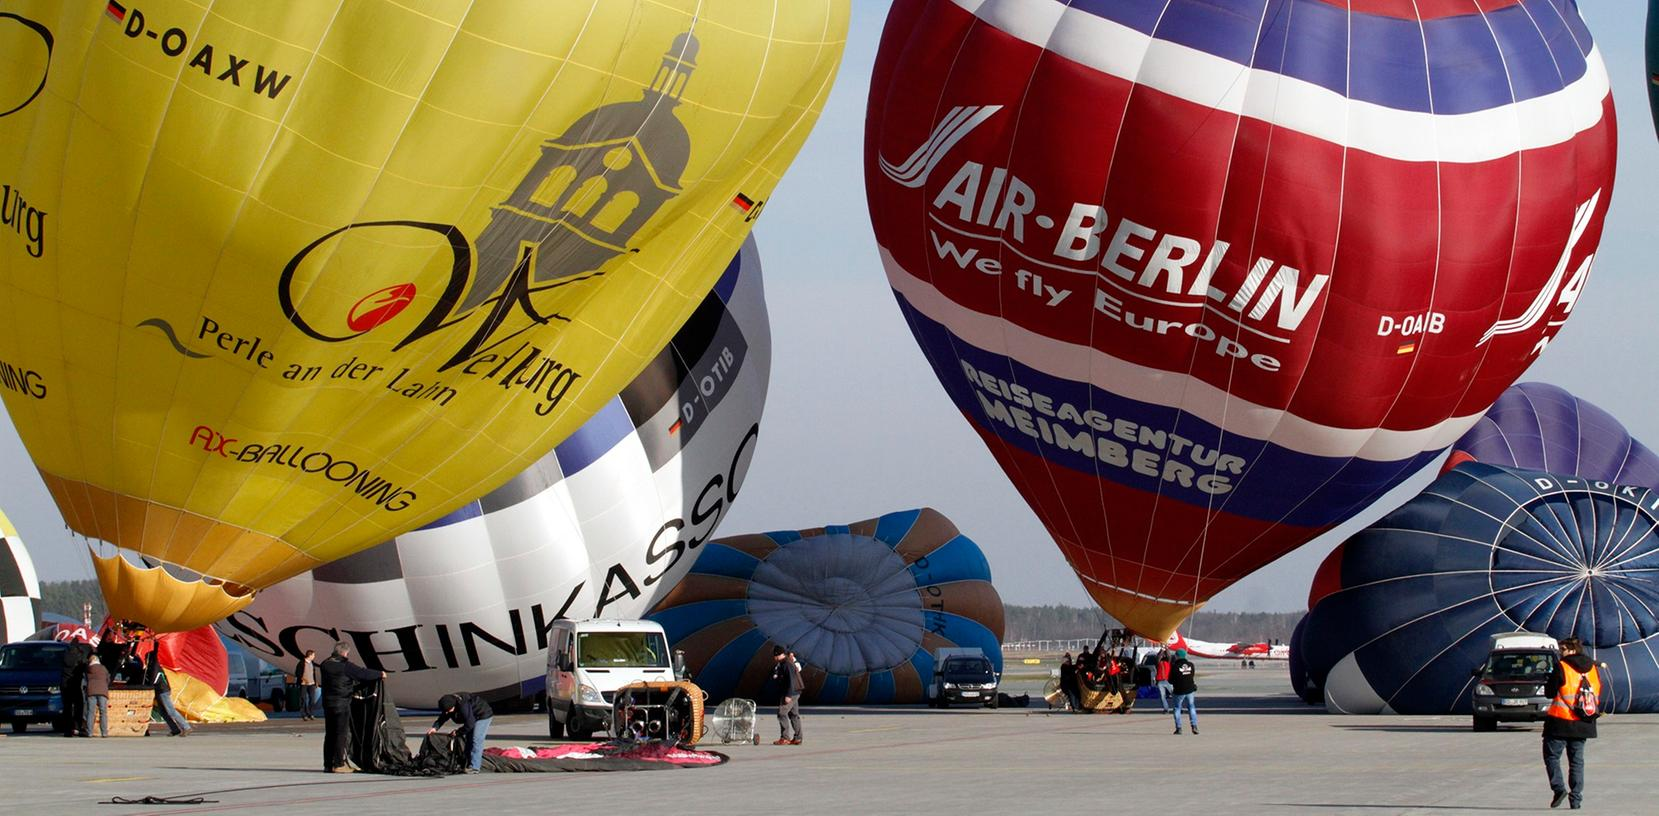 Über 30 Heißluftballons stiegen am Samstagnachmittag über Nürnberg auf.